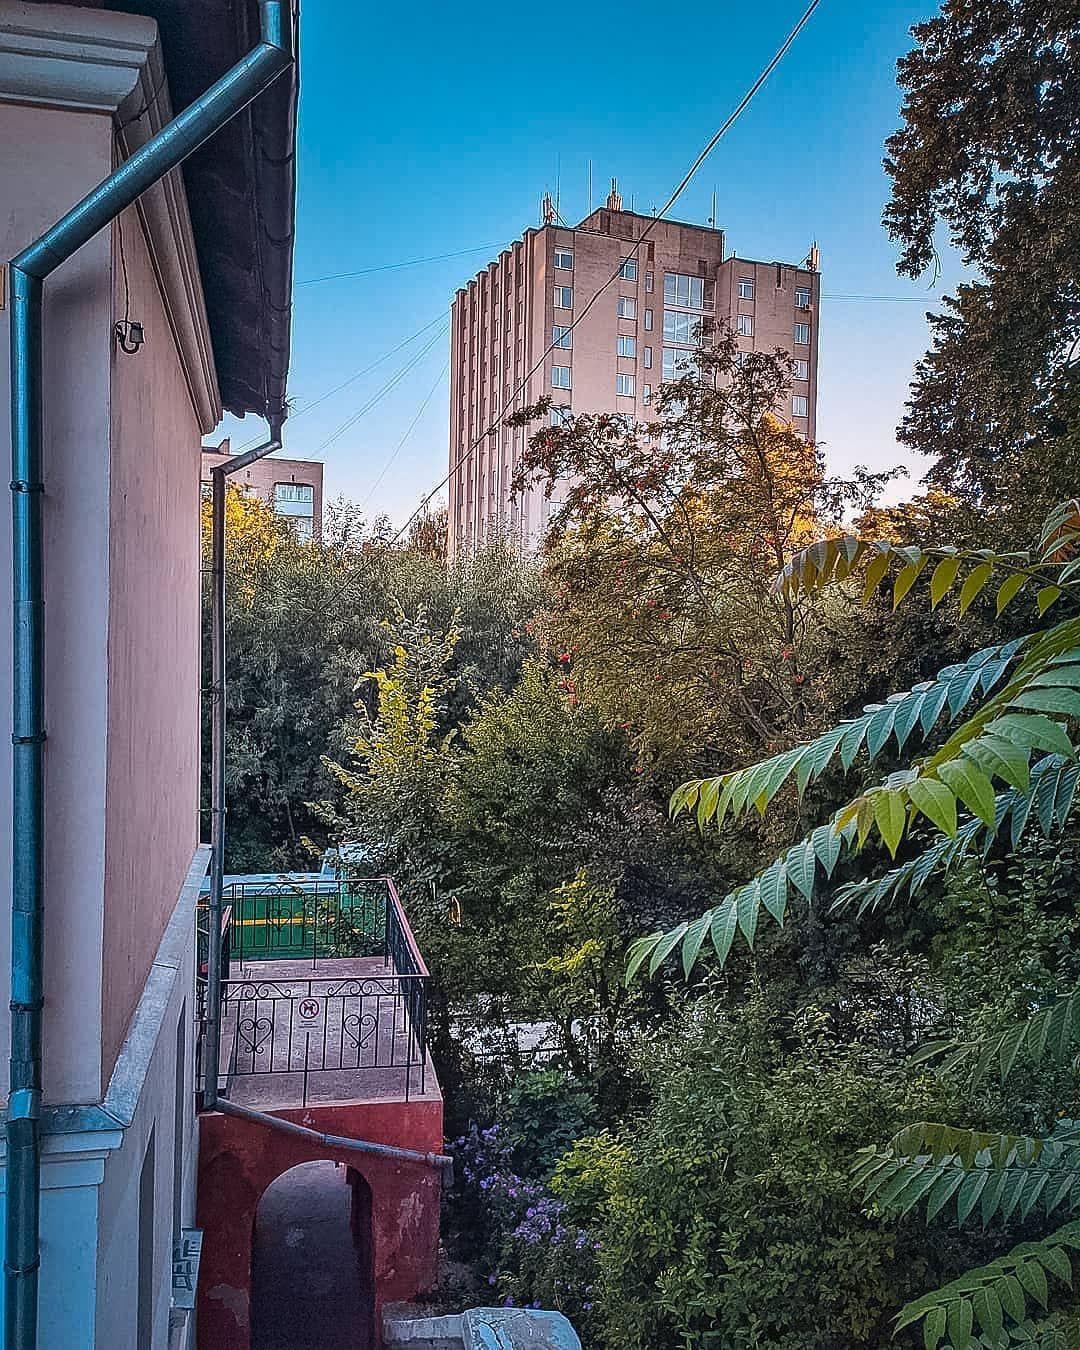 Міські контрасти... #summer #2020 #instalutsk #mylutsk #карантин2020 #trees #afterrain #lutsk_wow #lutsktogo #lutsktoday #lutsklife #photo #photos #pic #pics #picture #pictures #luckyman_lutsk #photooftheday #photogram #instagood #photooftheday #photoeveryday #beautiful #followme #follow #instagrammers @mylutsk #lutskcity